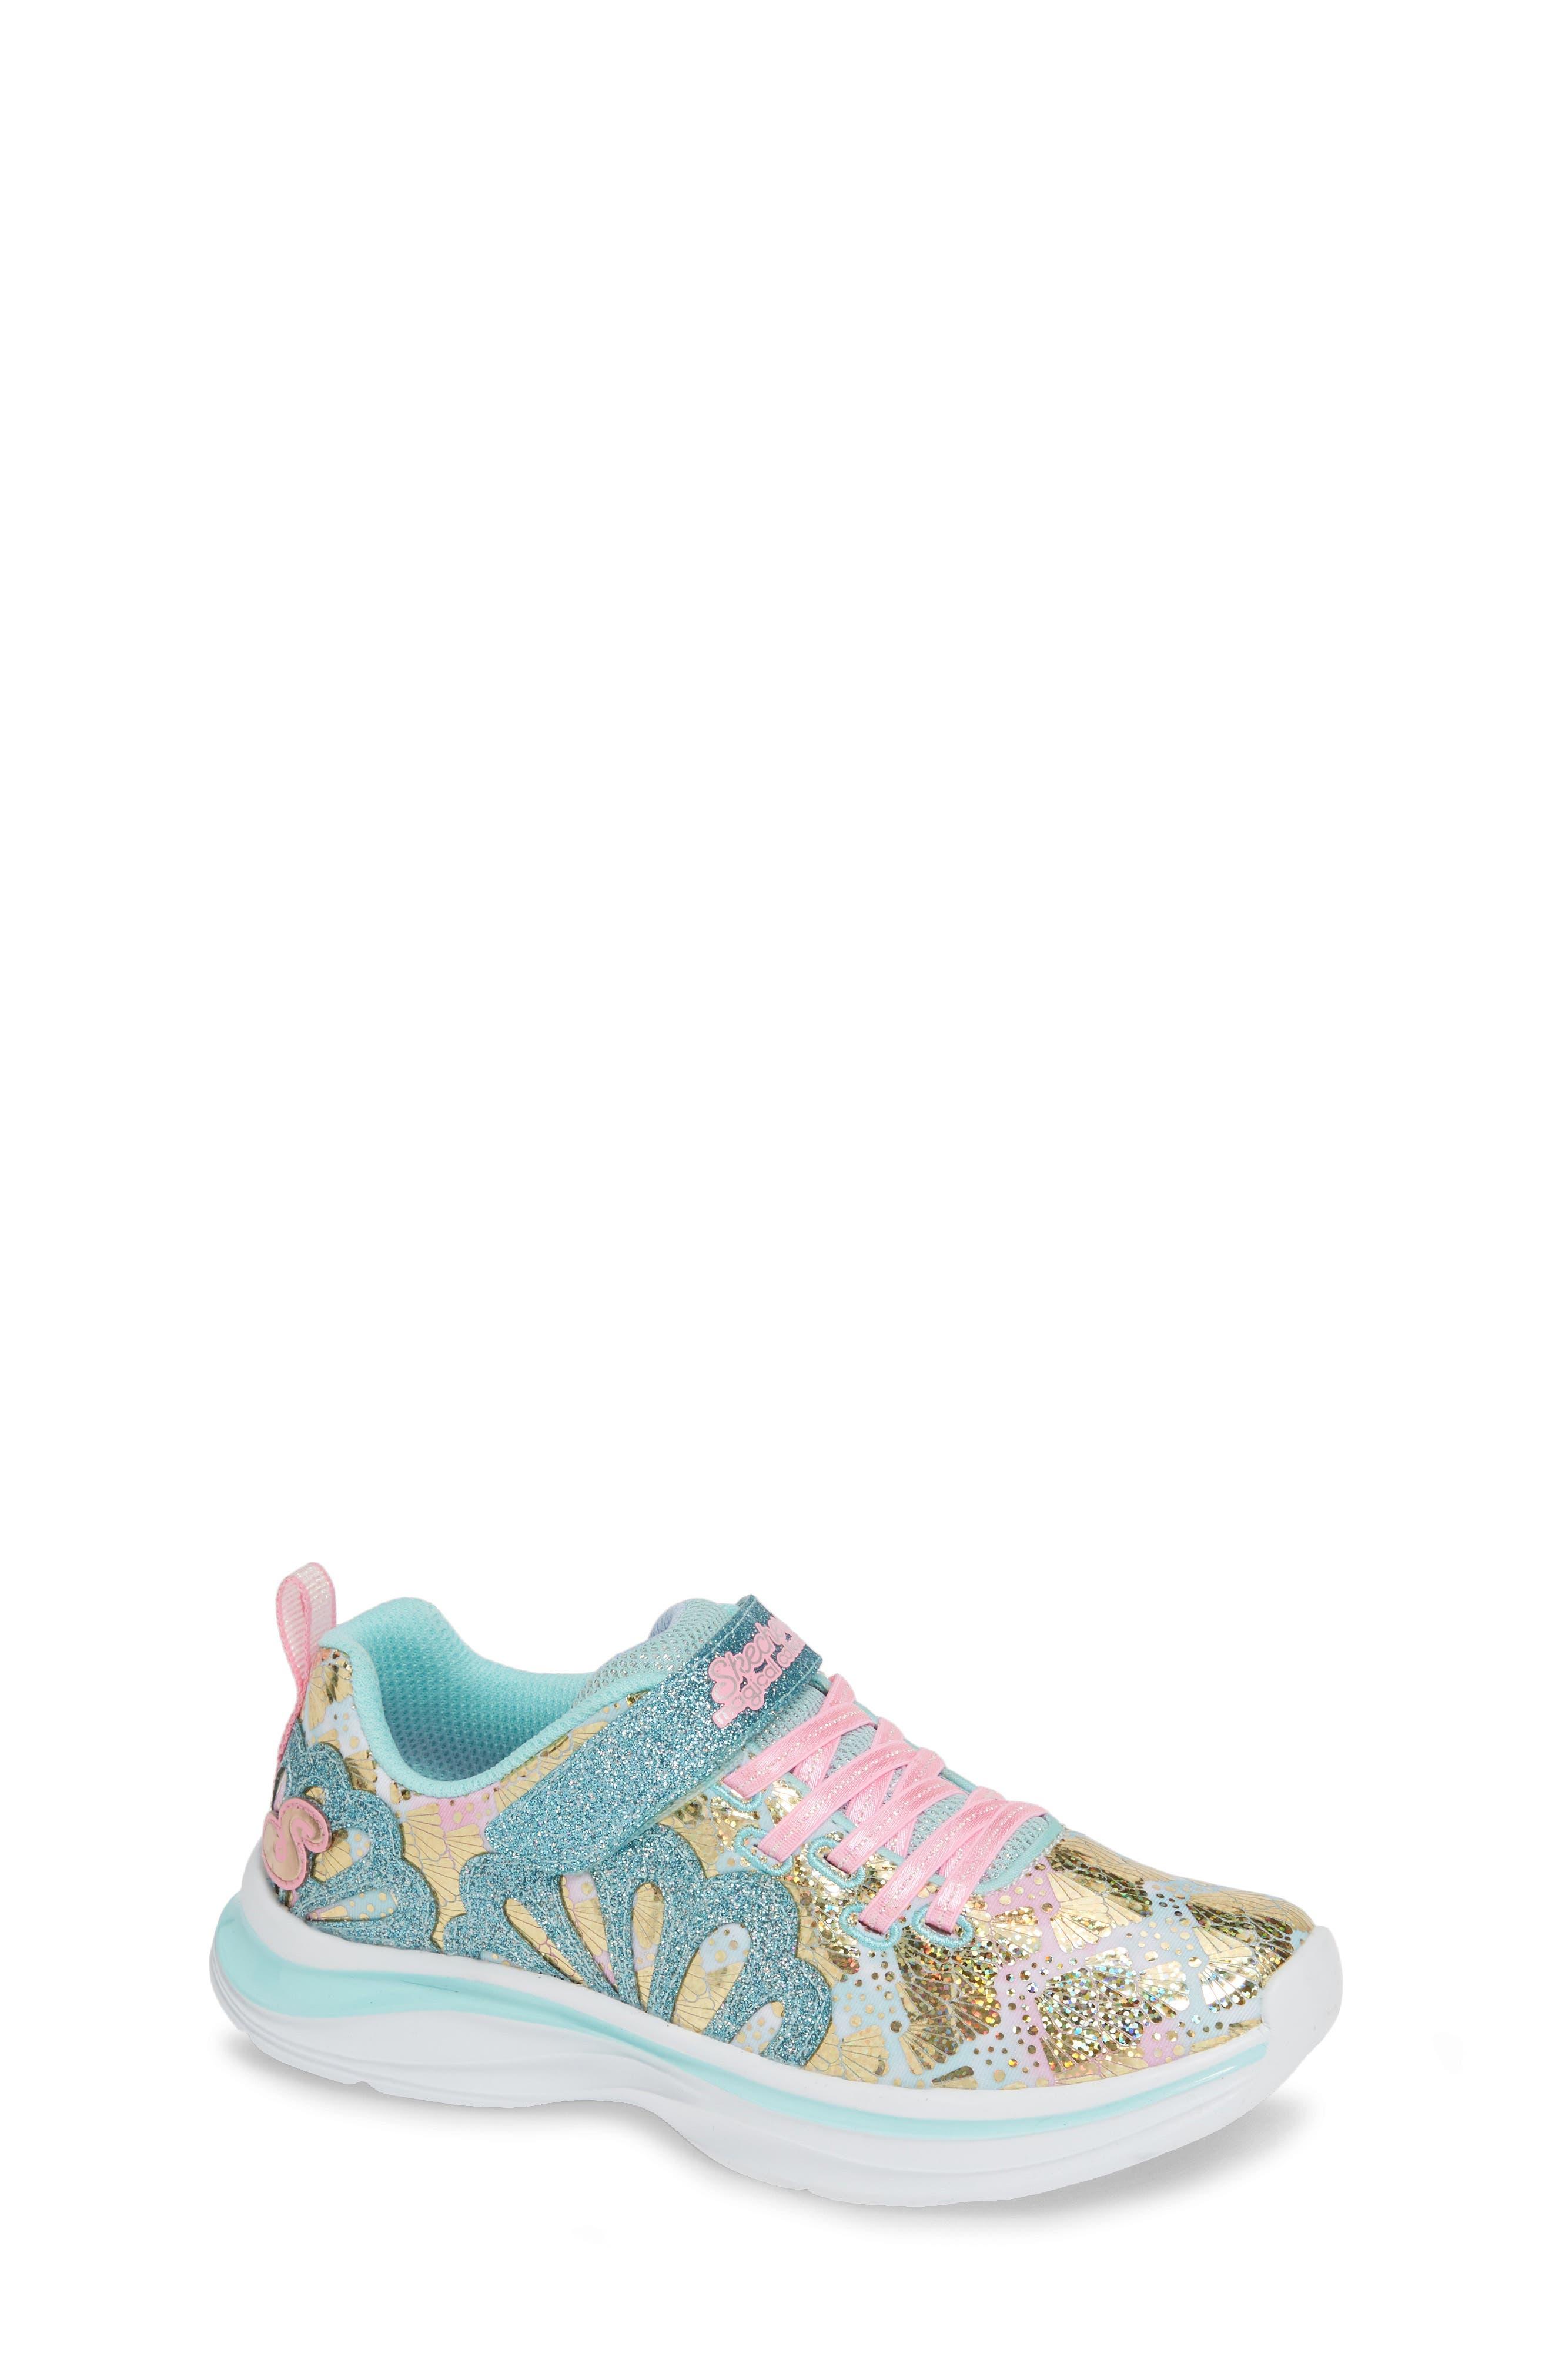 Double Dreams Shimmer Sneaker,                         Main,                         color, AQUA/ PINK TEXTILE